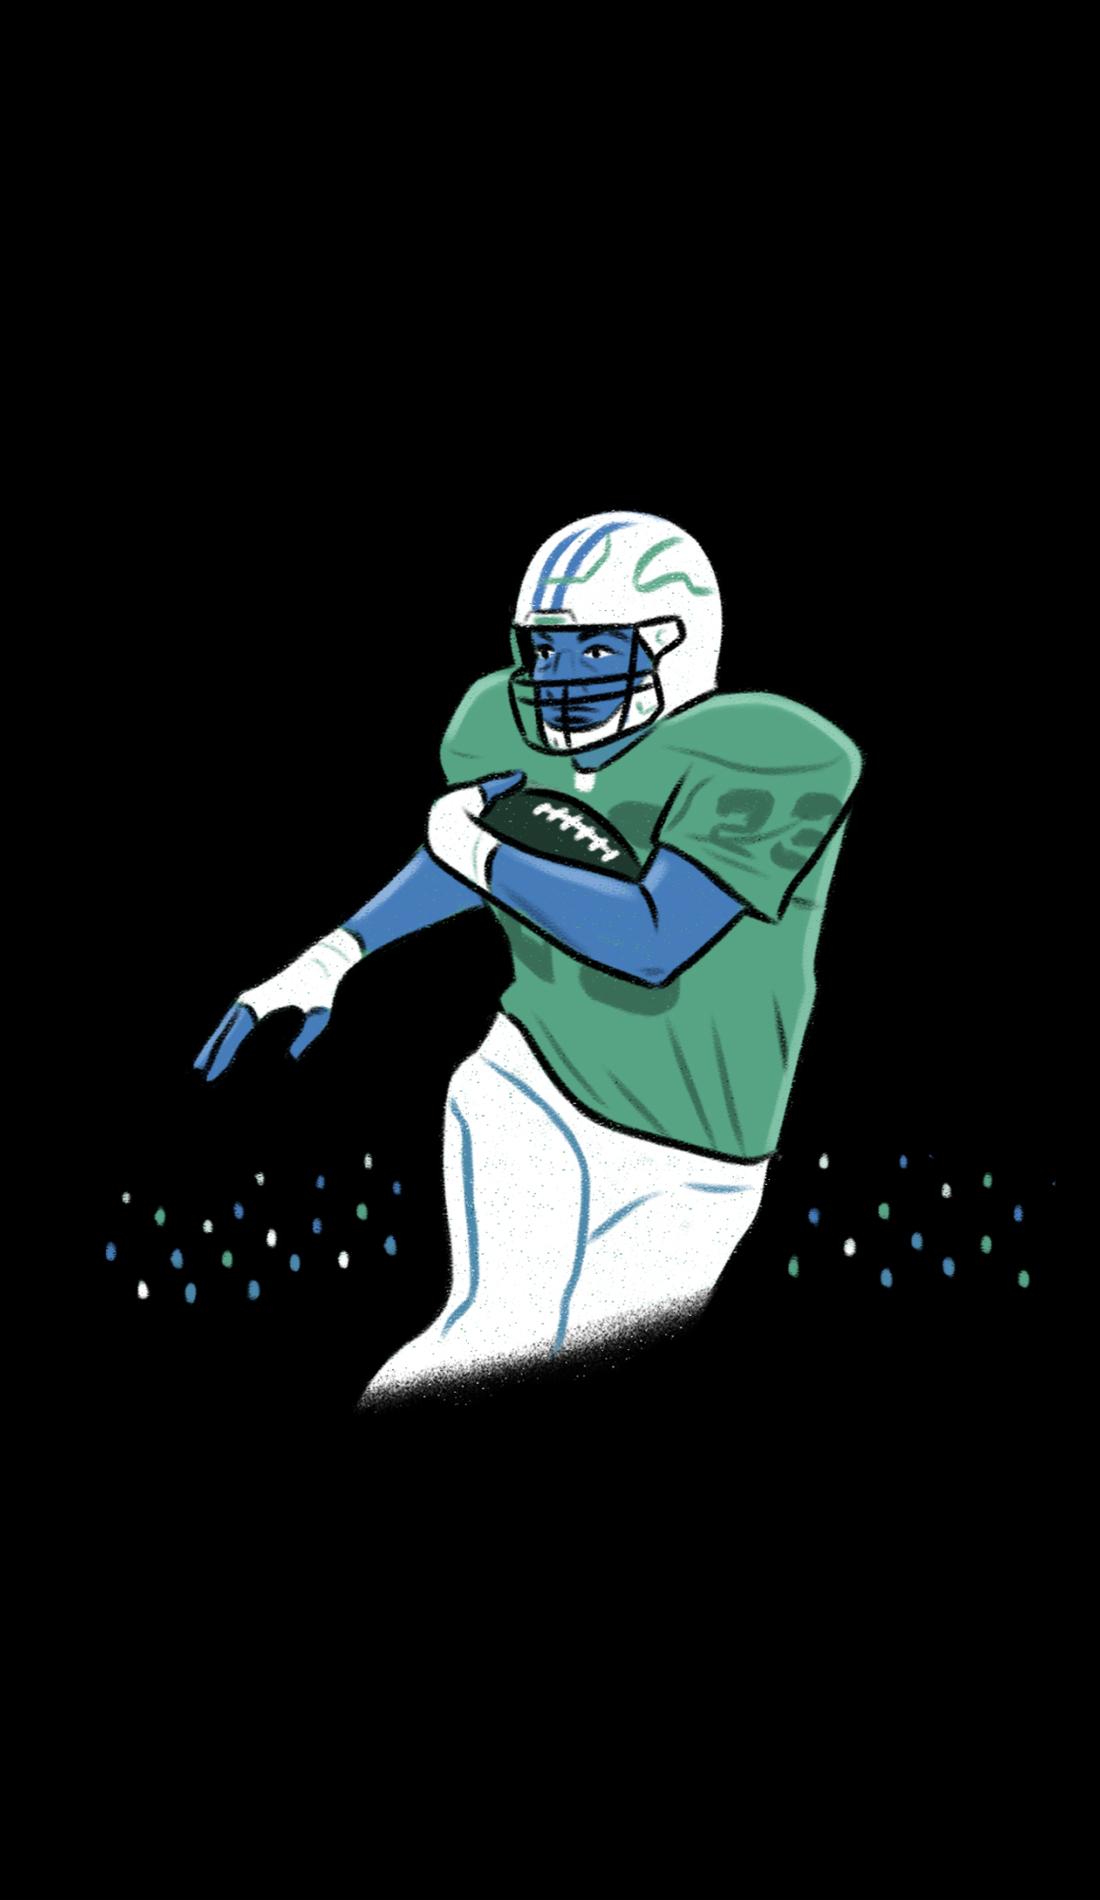 A Stony Brook Seawolves Football live event